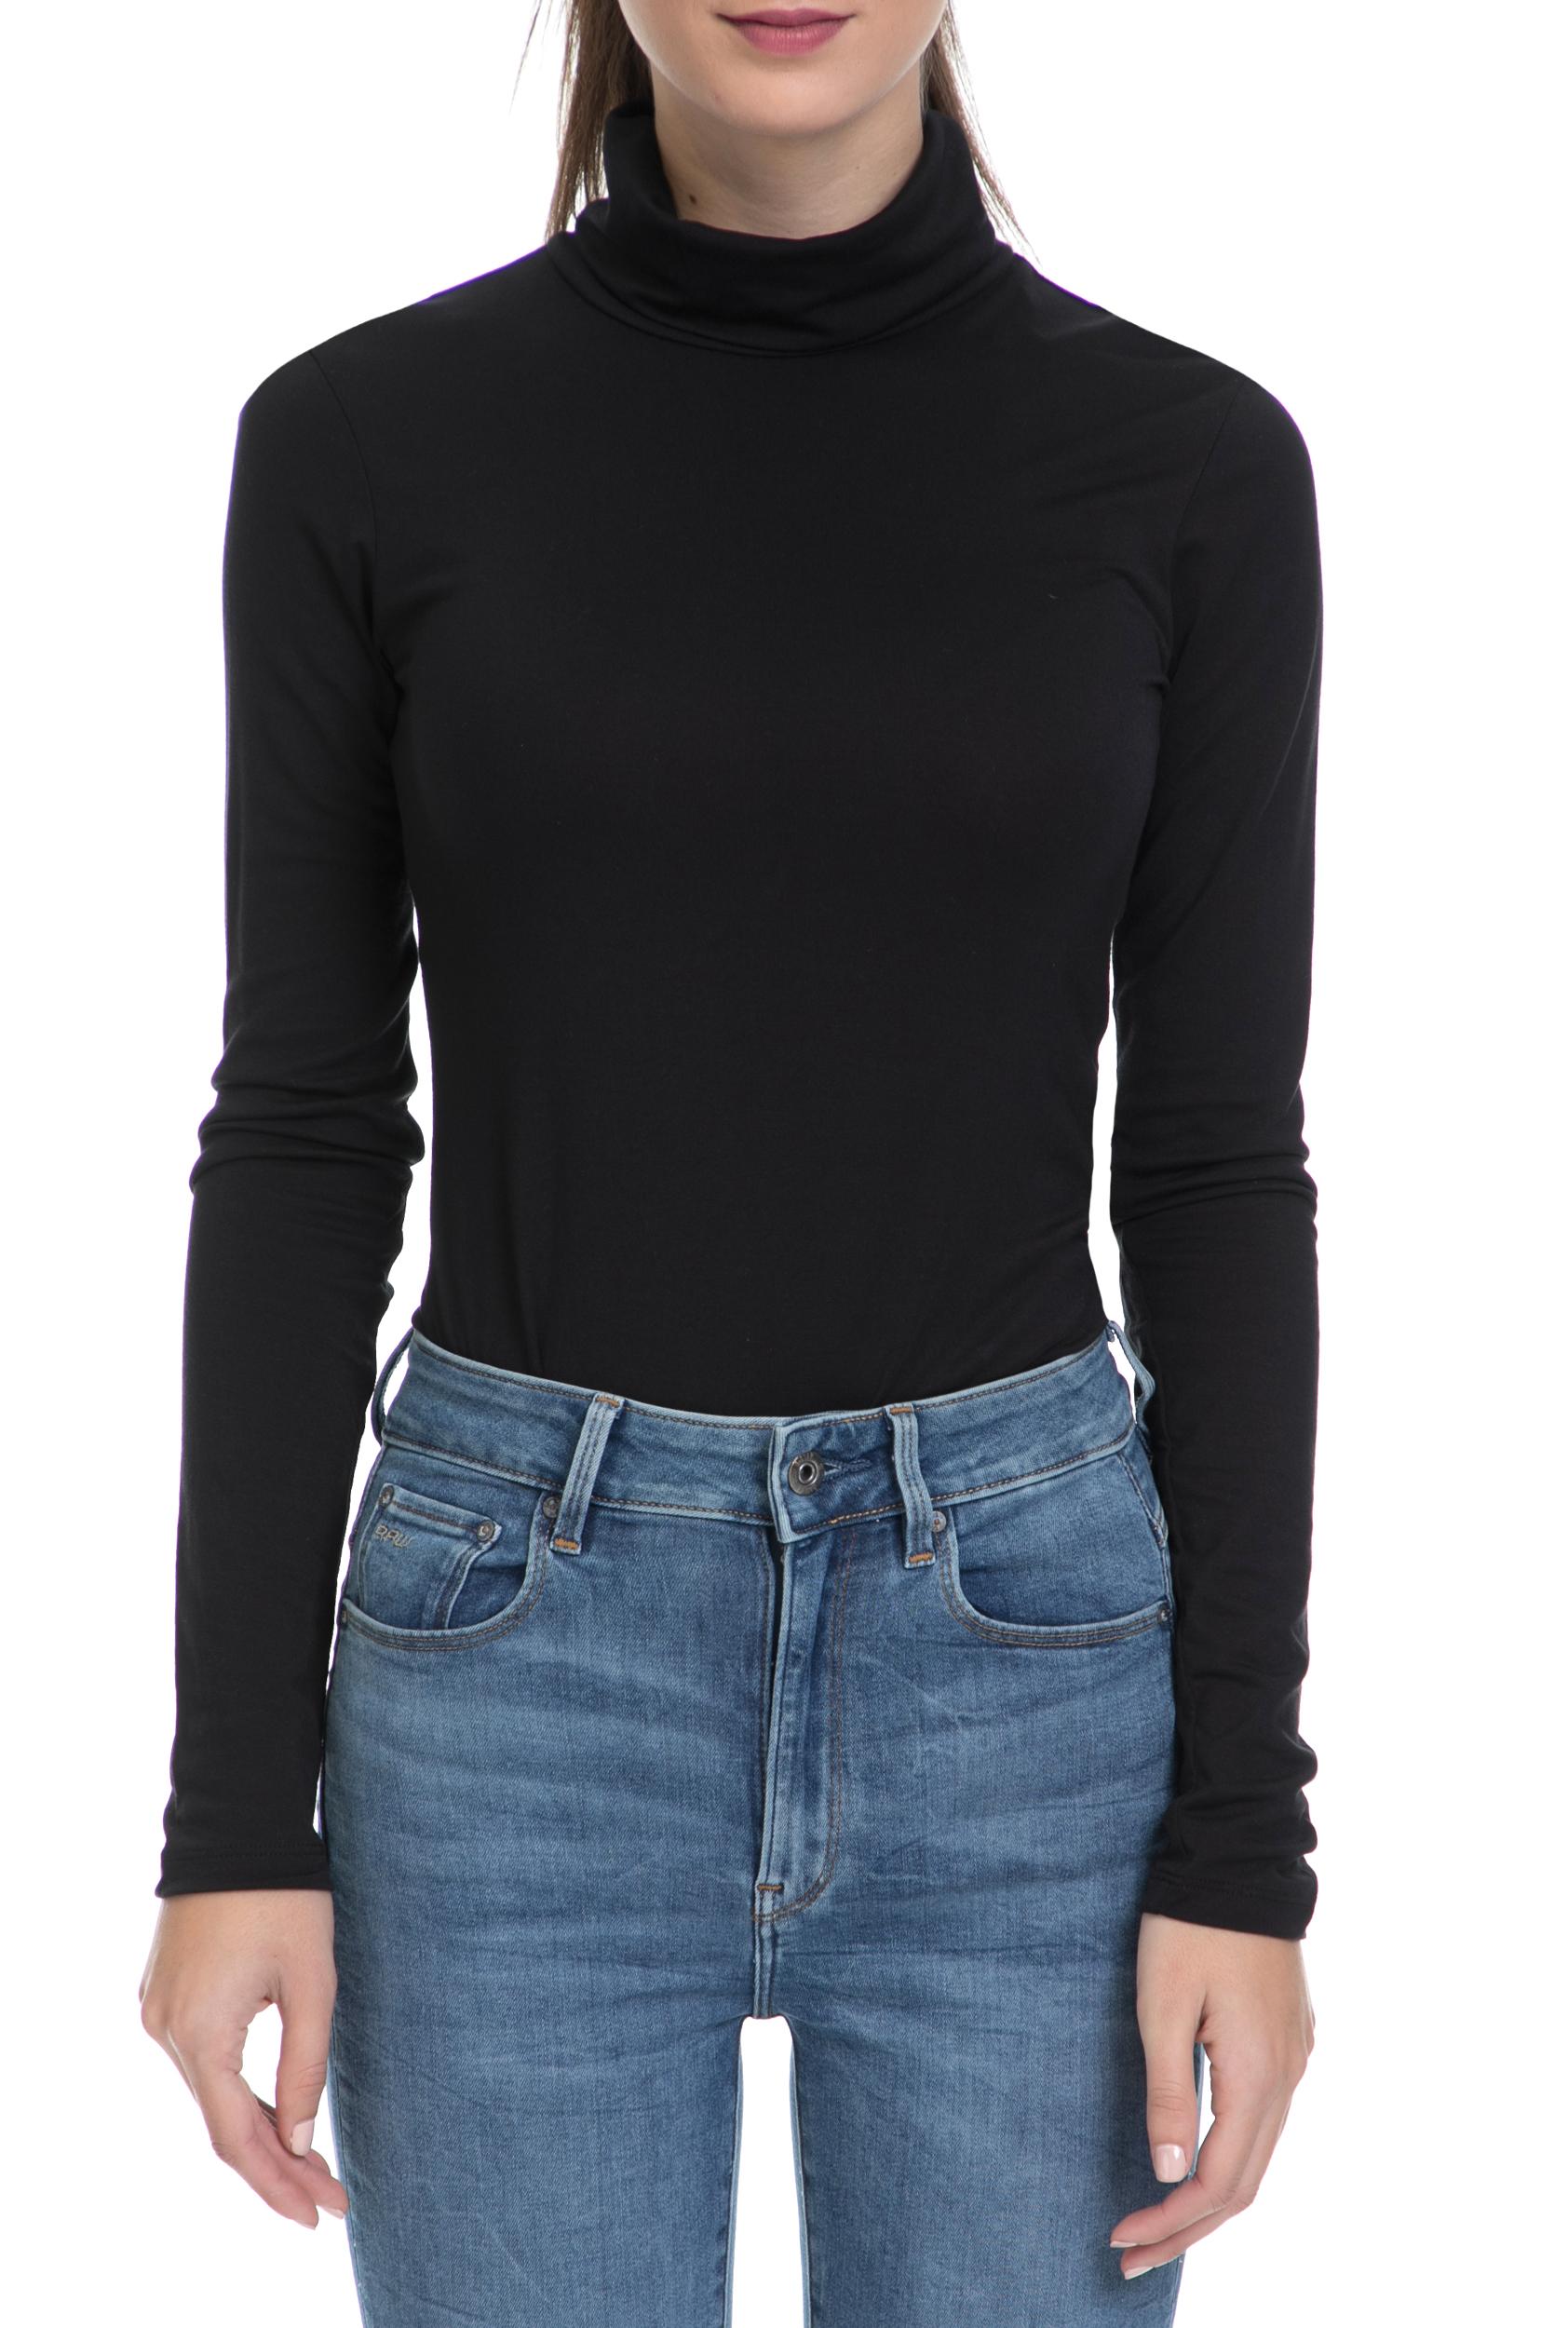 SCOTCH & SODA - Γυναικείο κορμάκι Maison Scotch μαύρο γυναικεία ρούχα εσώρουχα κορμάκια